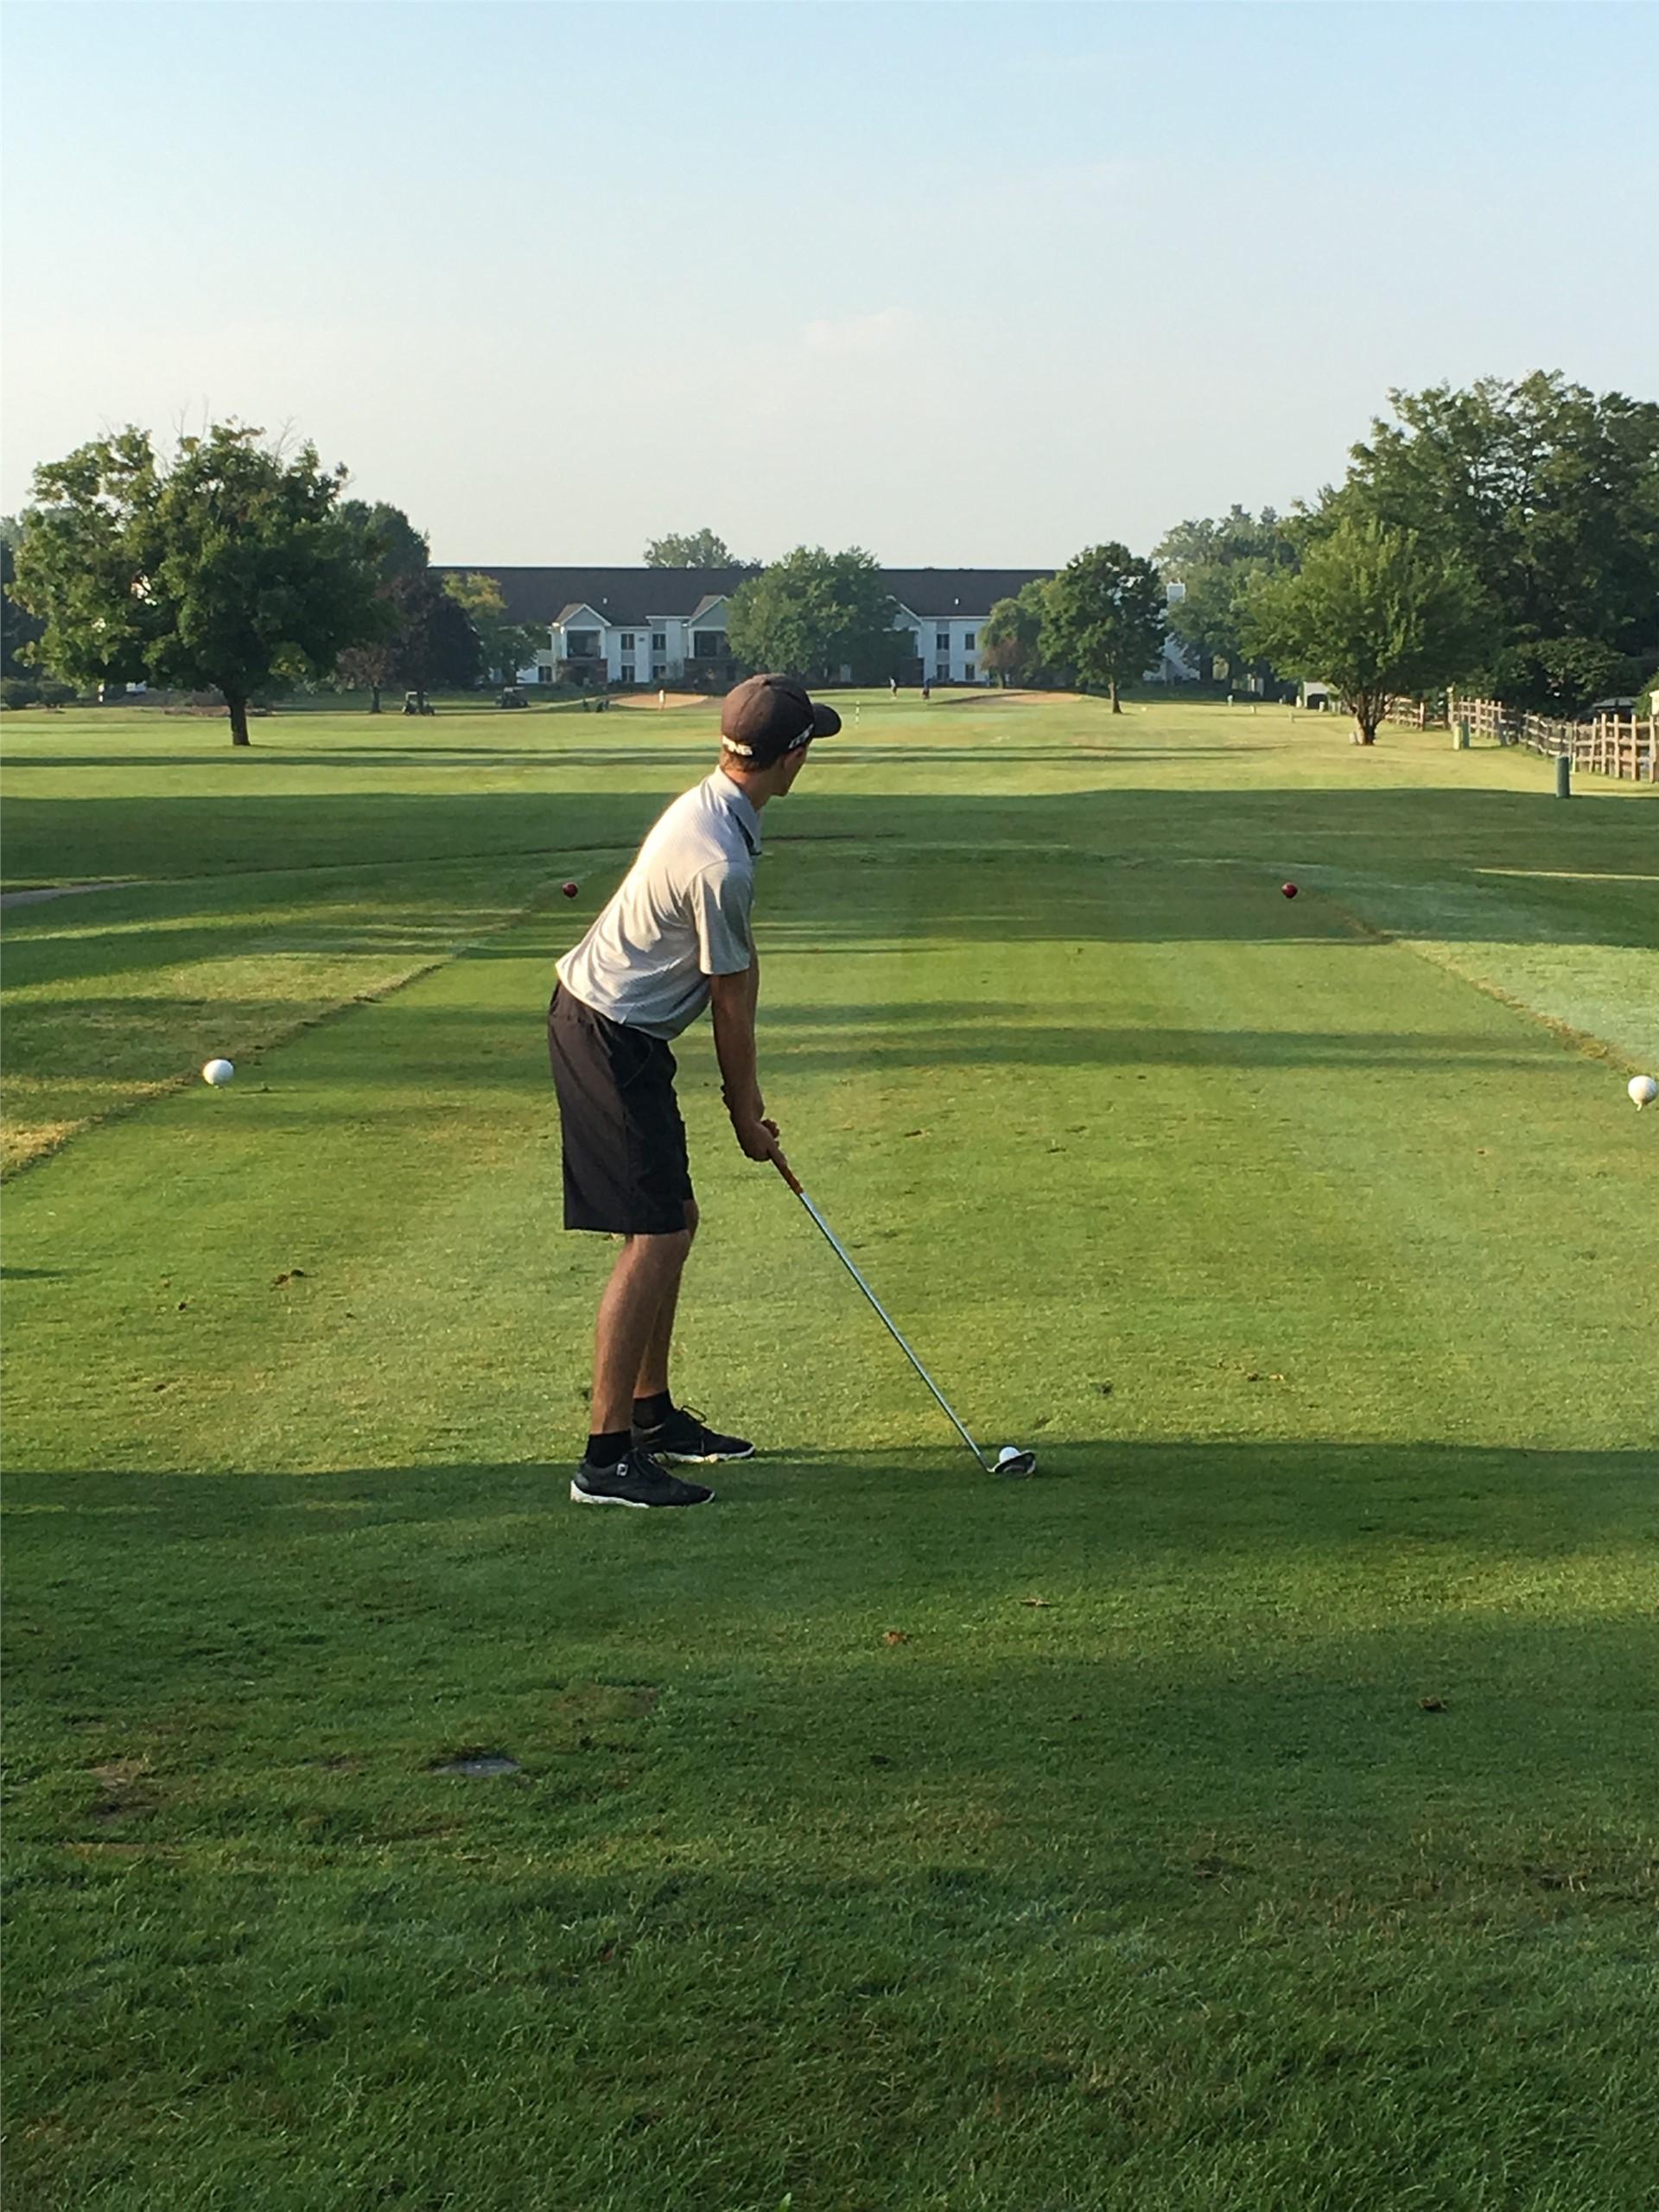 PHS student athlete hitting a golf ball